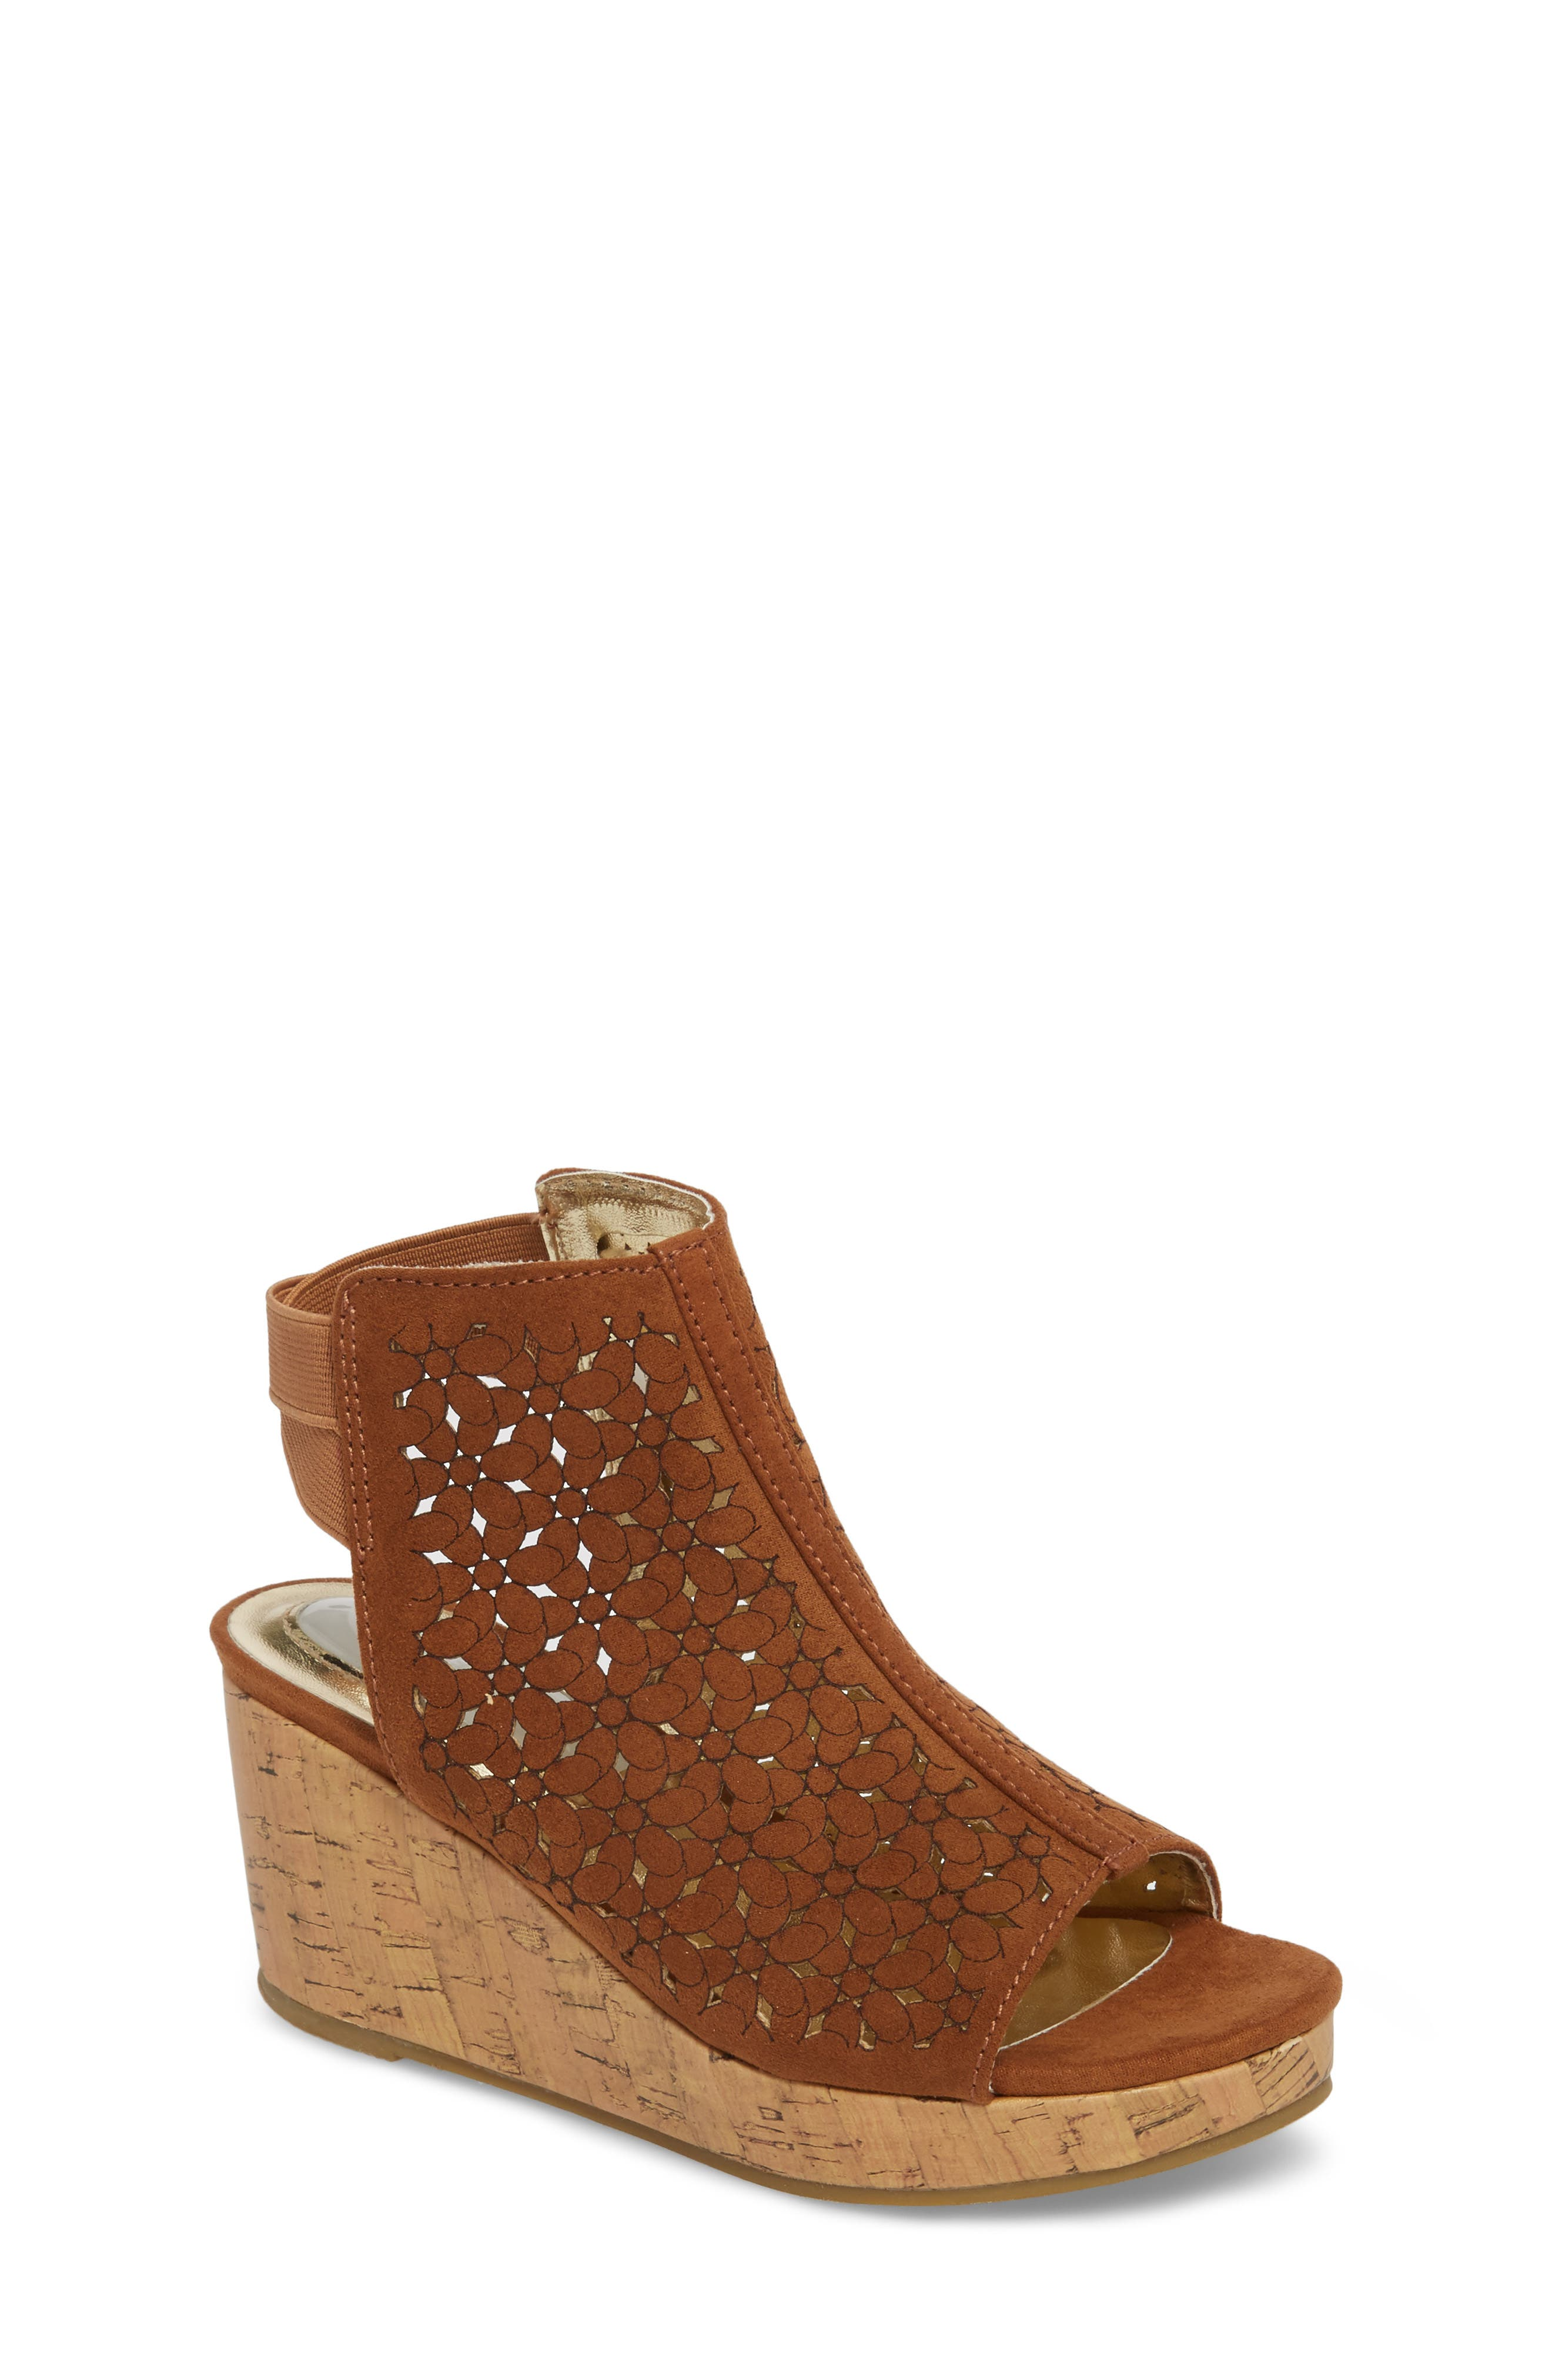 Corrine Finestra Wedge Sandal,                         Main,                         color, 255